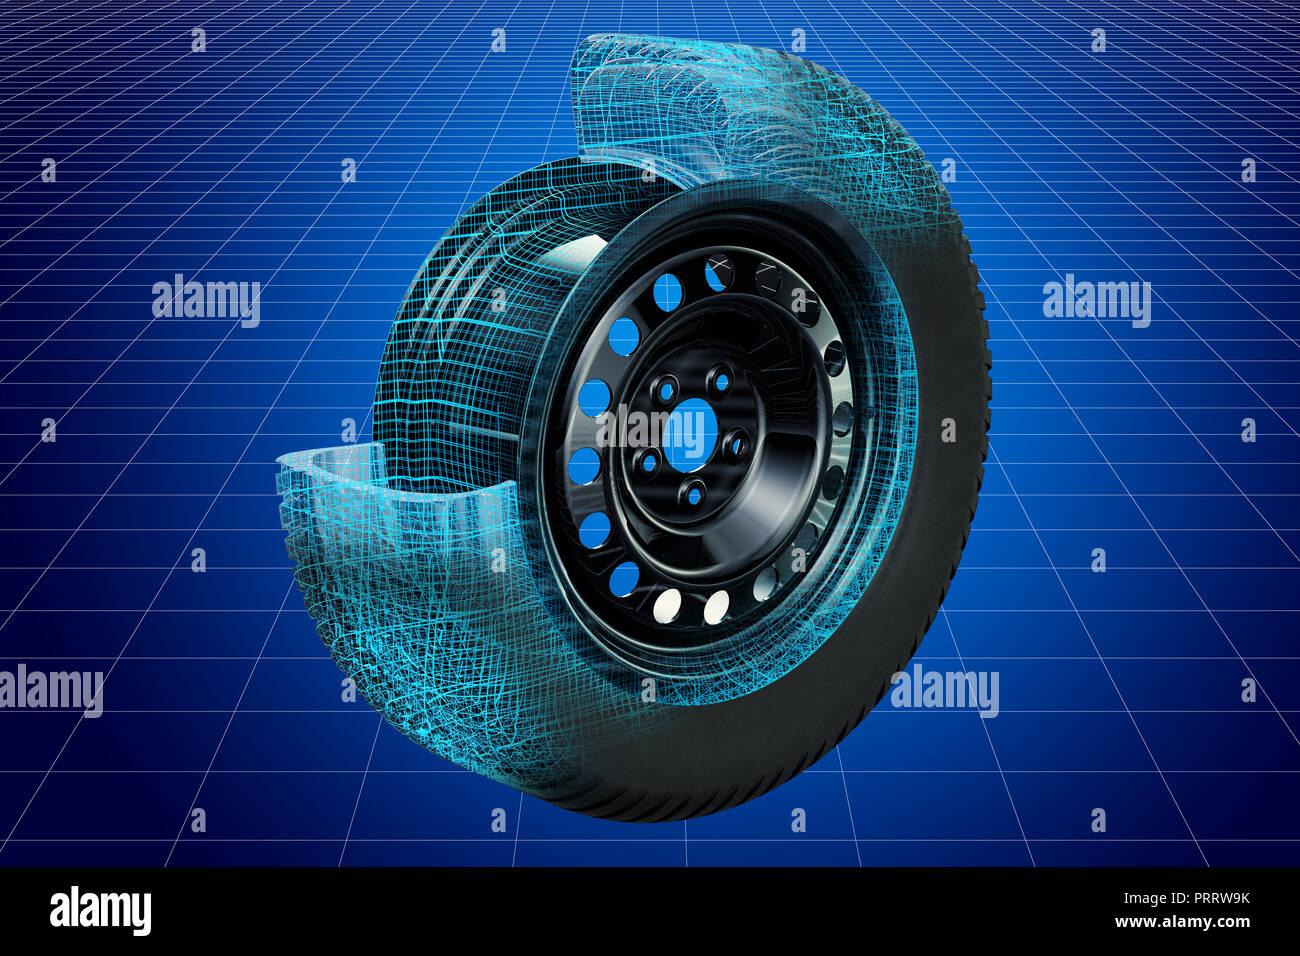 349d2d3c6752 Visualización de modelos CAD en 3D de la rueda del coche